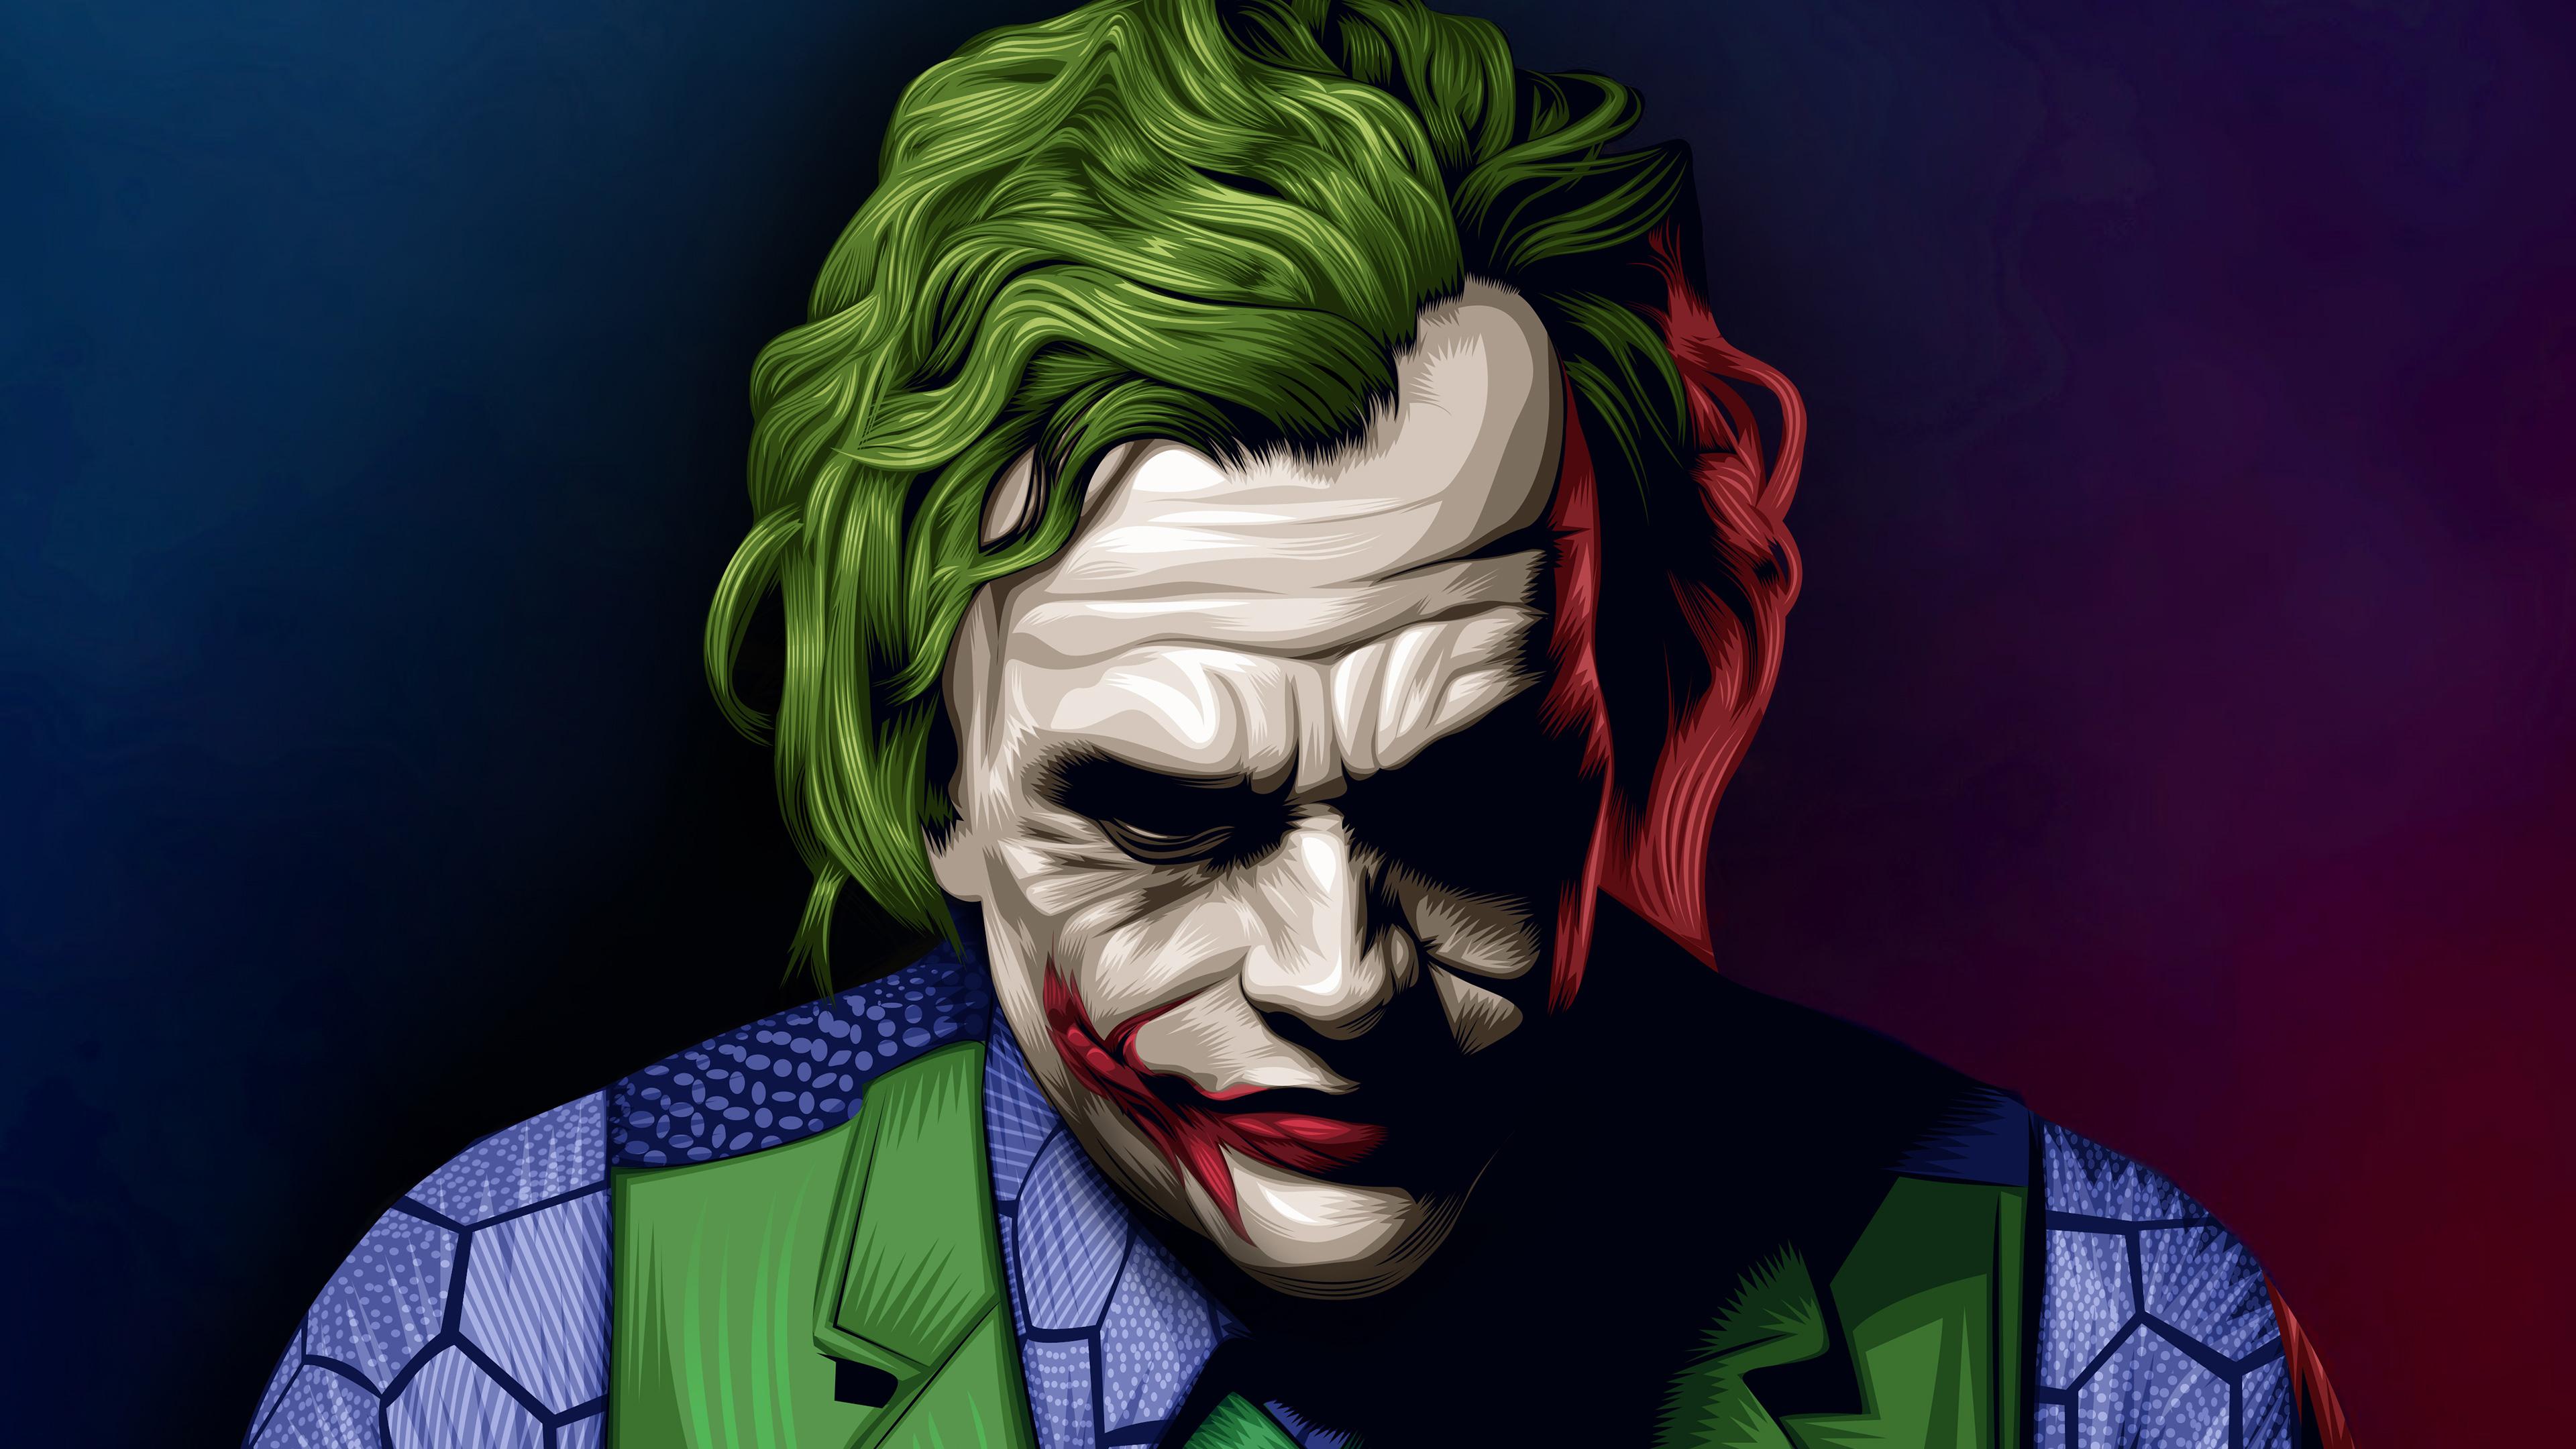 joker heath ledger illustration 1536522551 - Joker Heath Ledger Illustration - superheroes wallpapers, joker wallpapers, hd-wallpapers, digital art wallpapers, behance wallpapers, artwork wallpapers, artist wallpapers, 4k-wallpapers